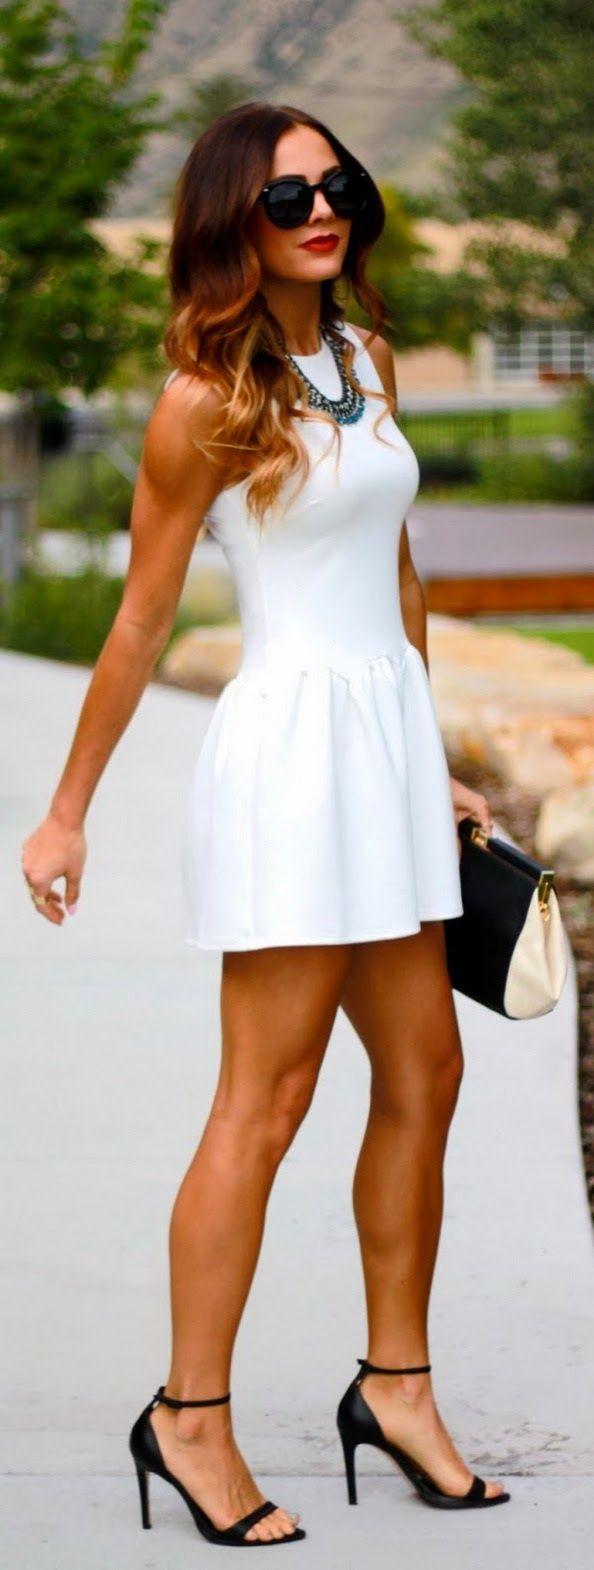 Black Heels White Dress